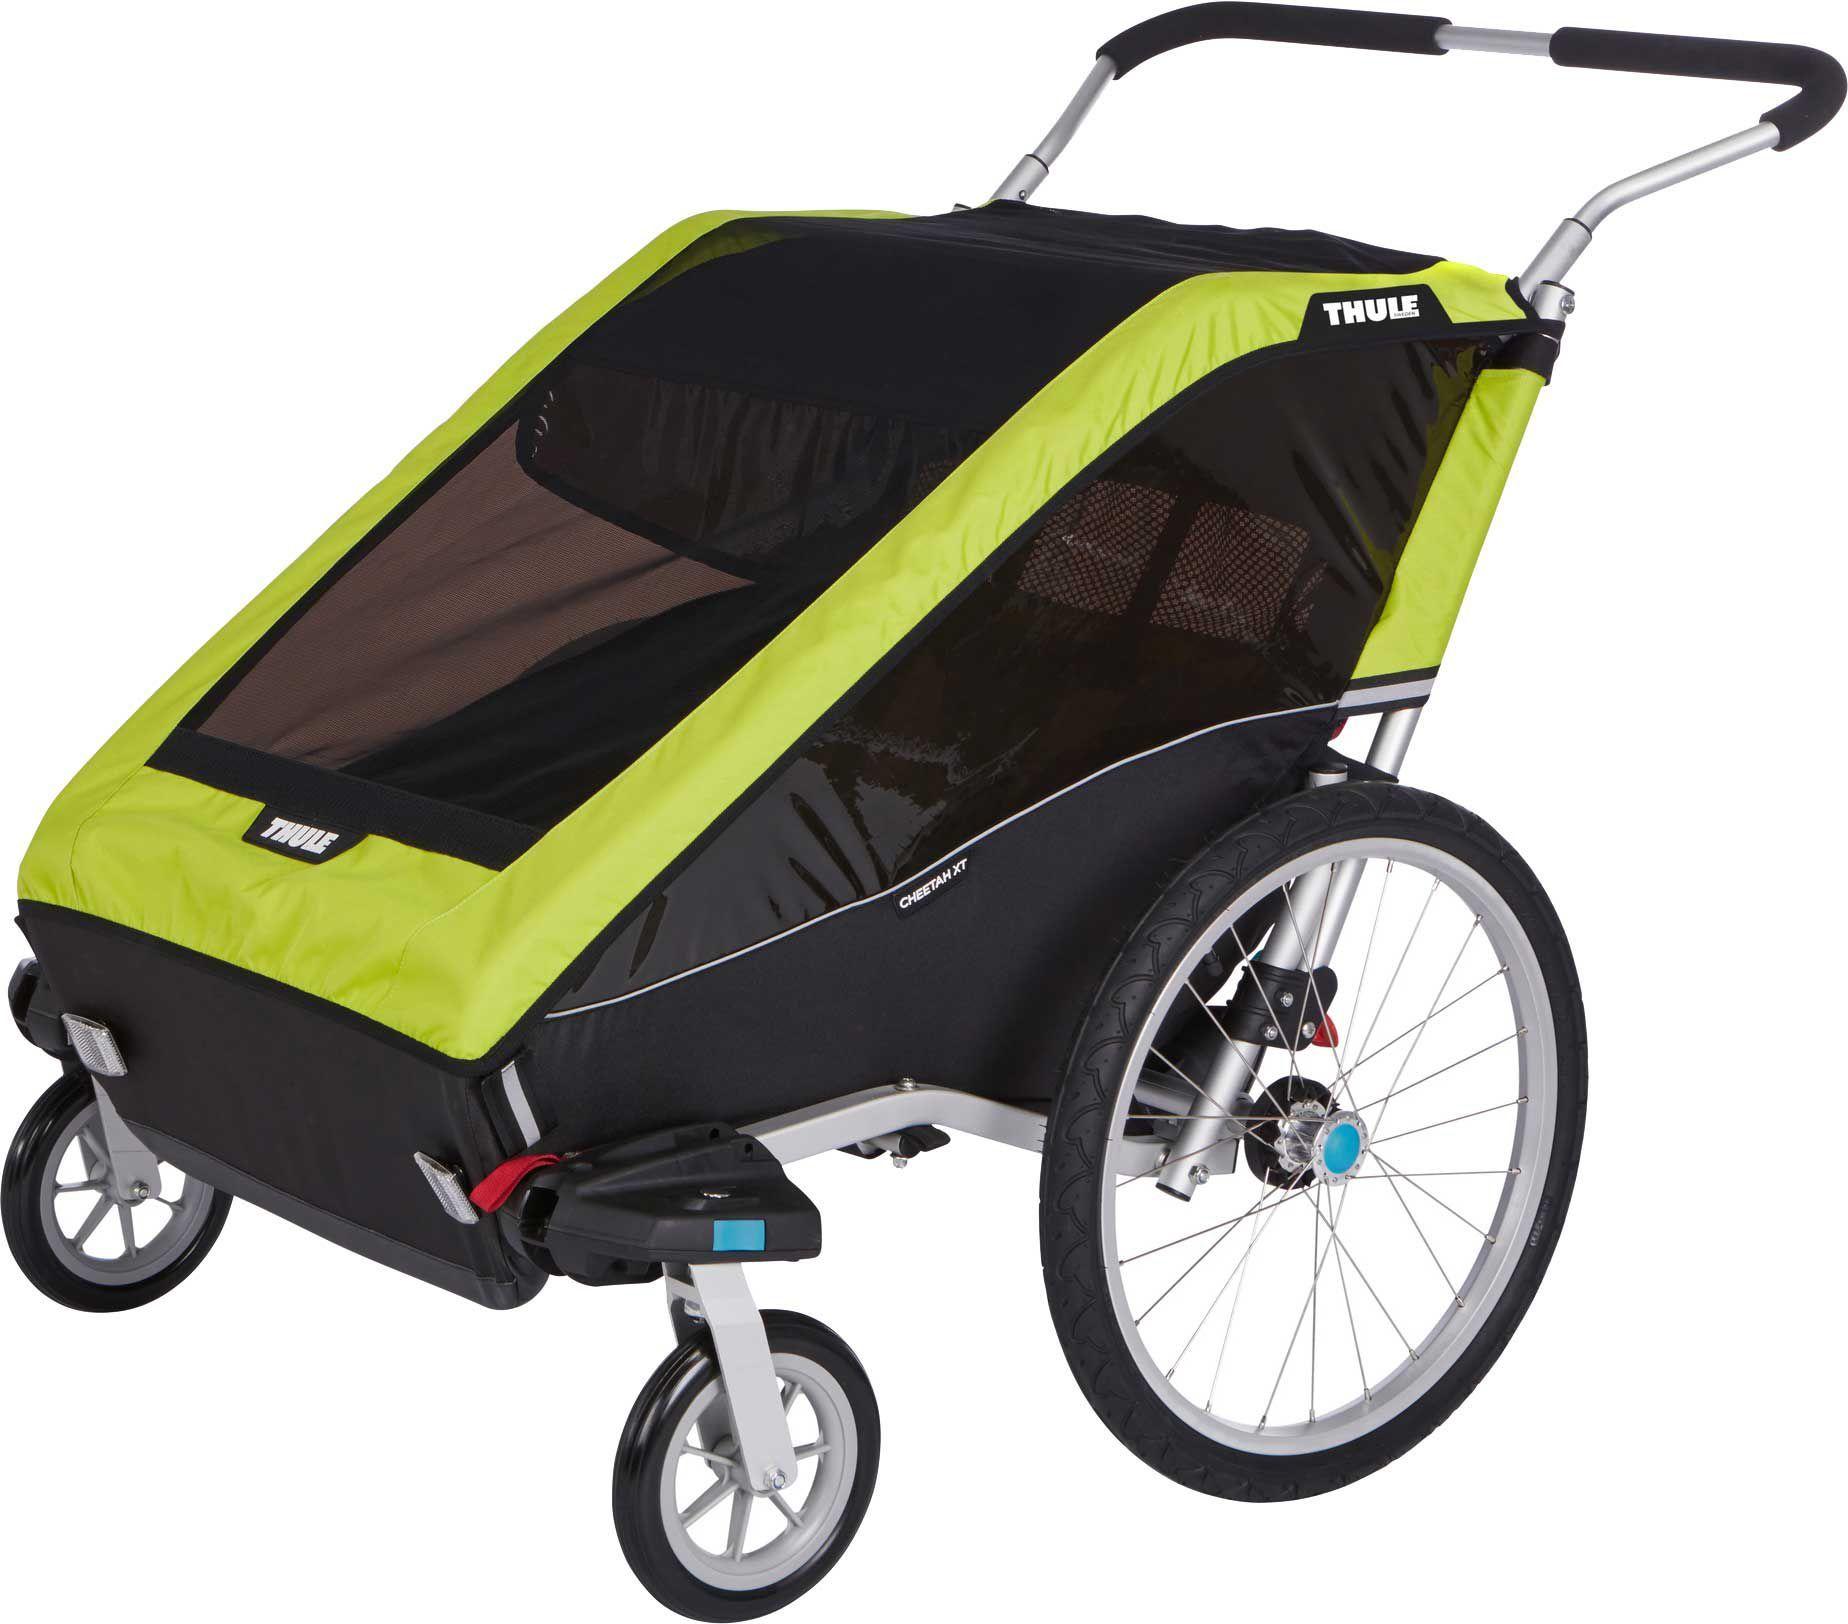 Thule Chariot Cheetah XT 2 Double Bike Trailer and ...